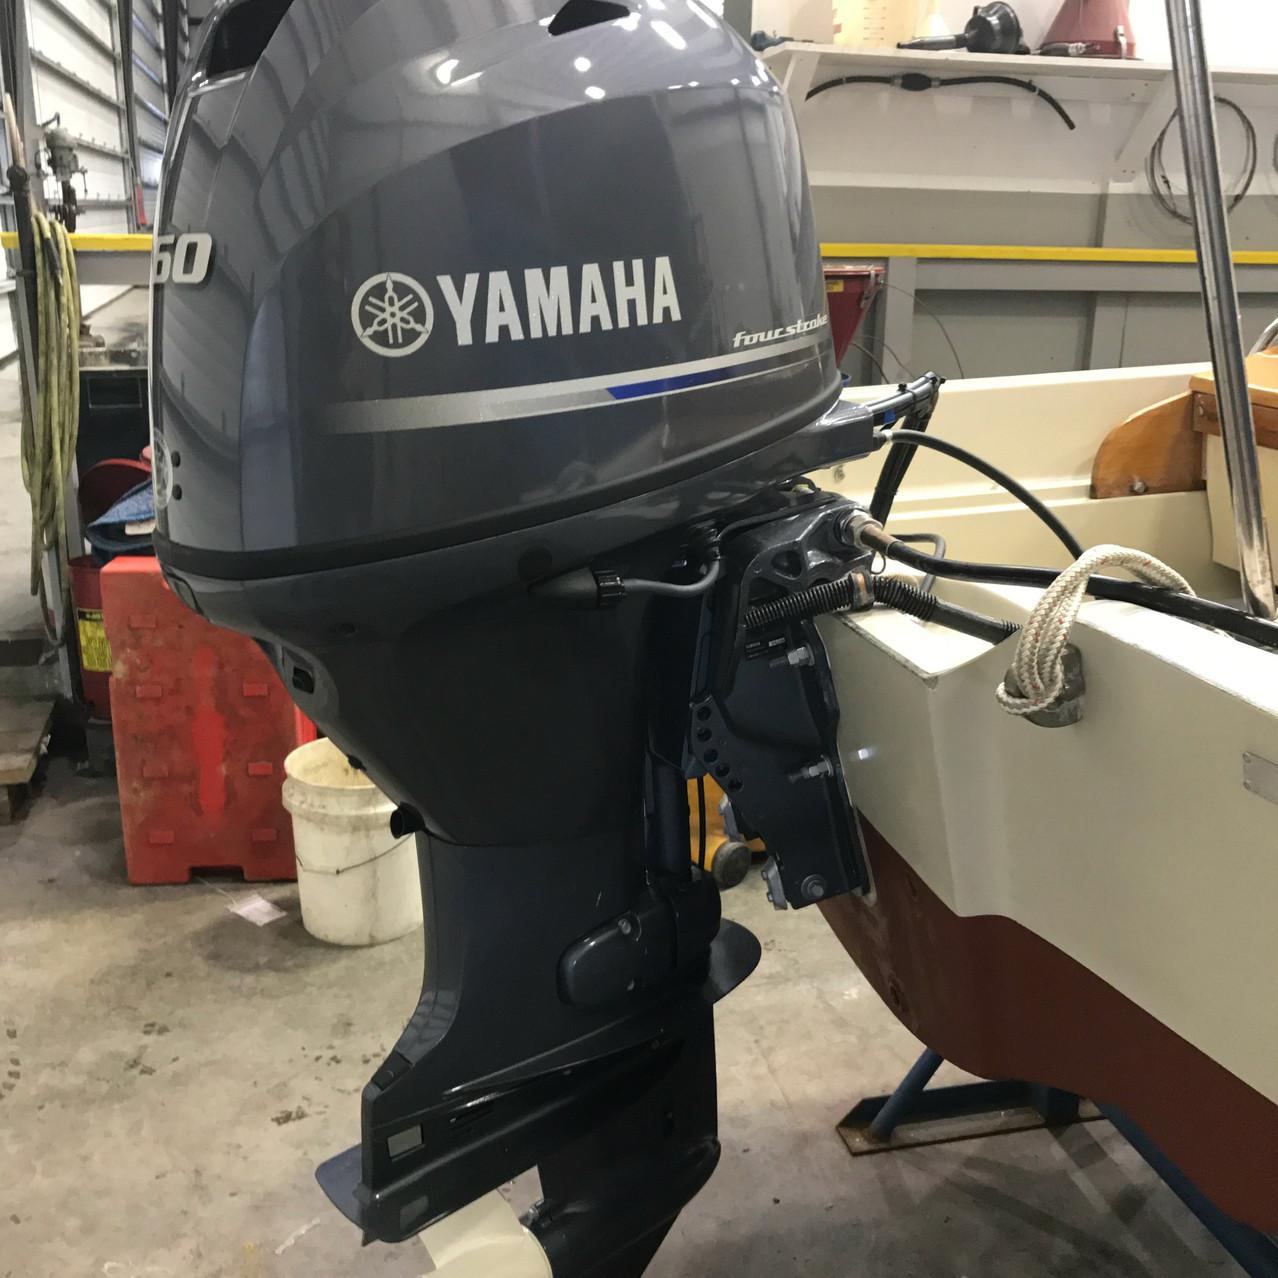 Yamaha F60 Engine Repower